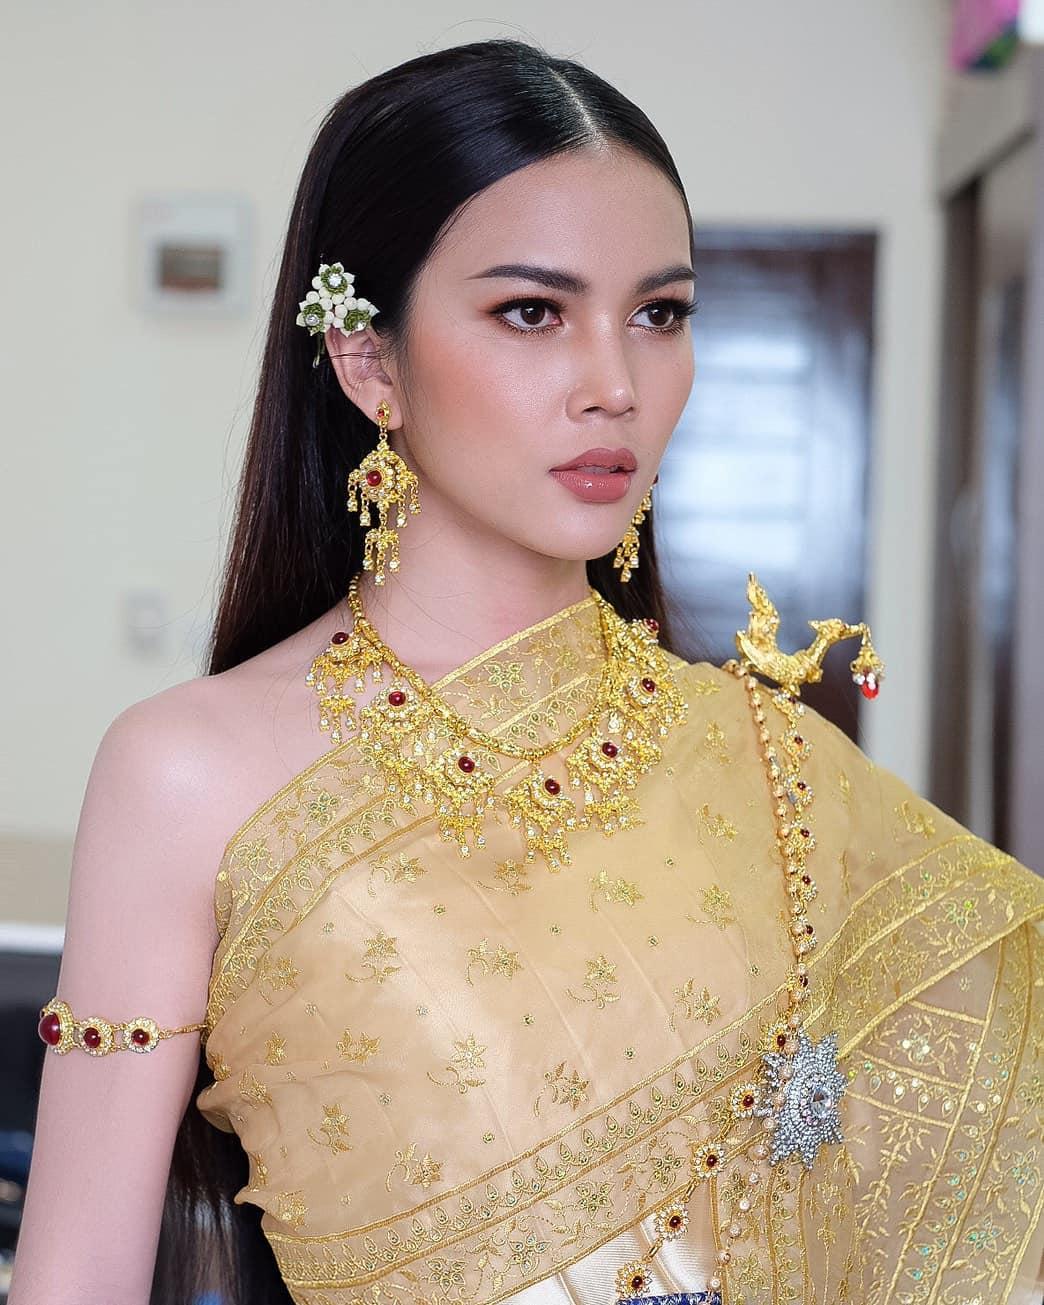 Karnchaya Alice - Most Pretty Ladyboy Thailand - Thai